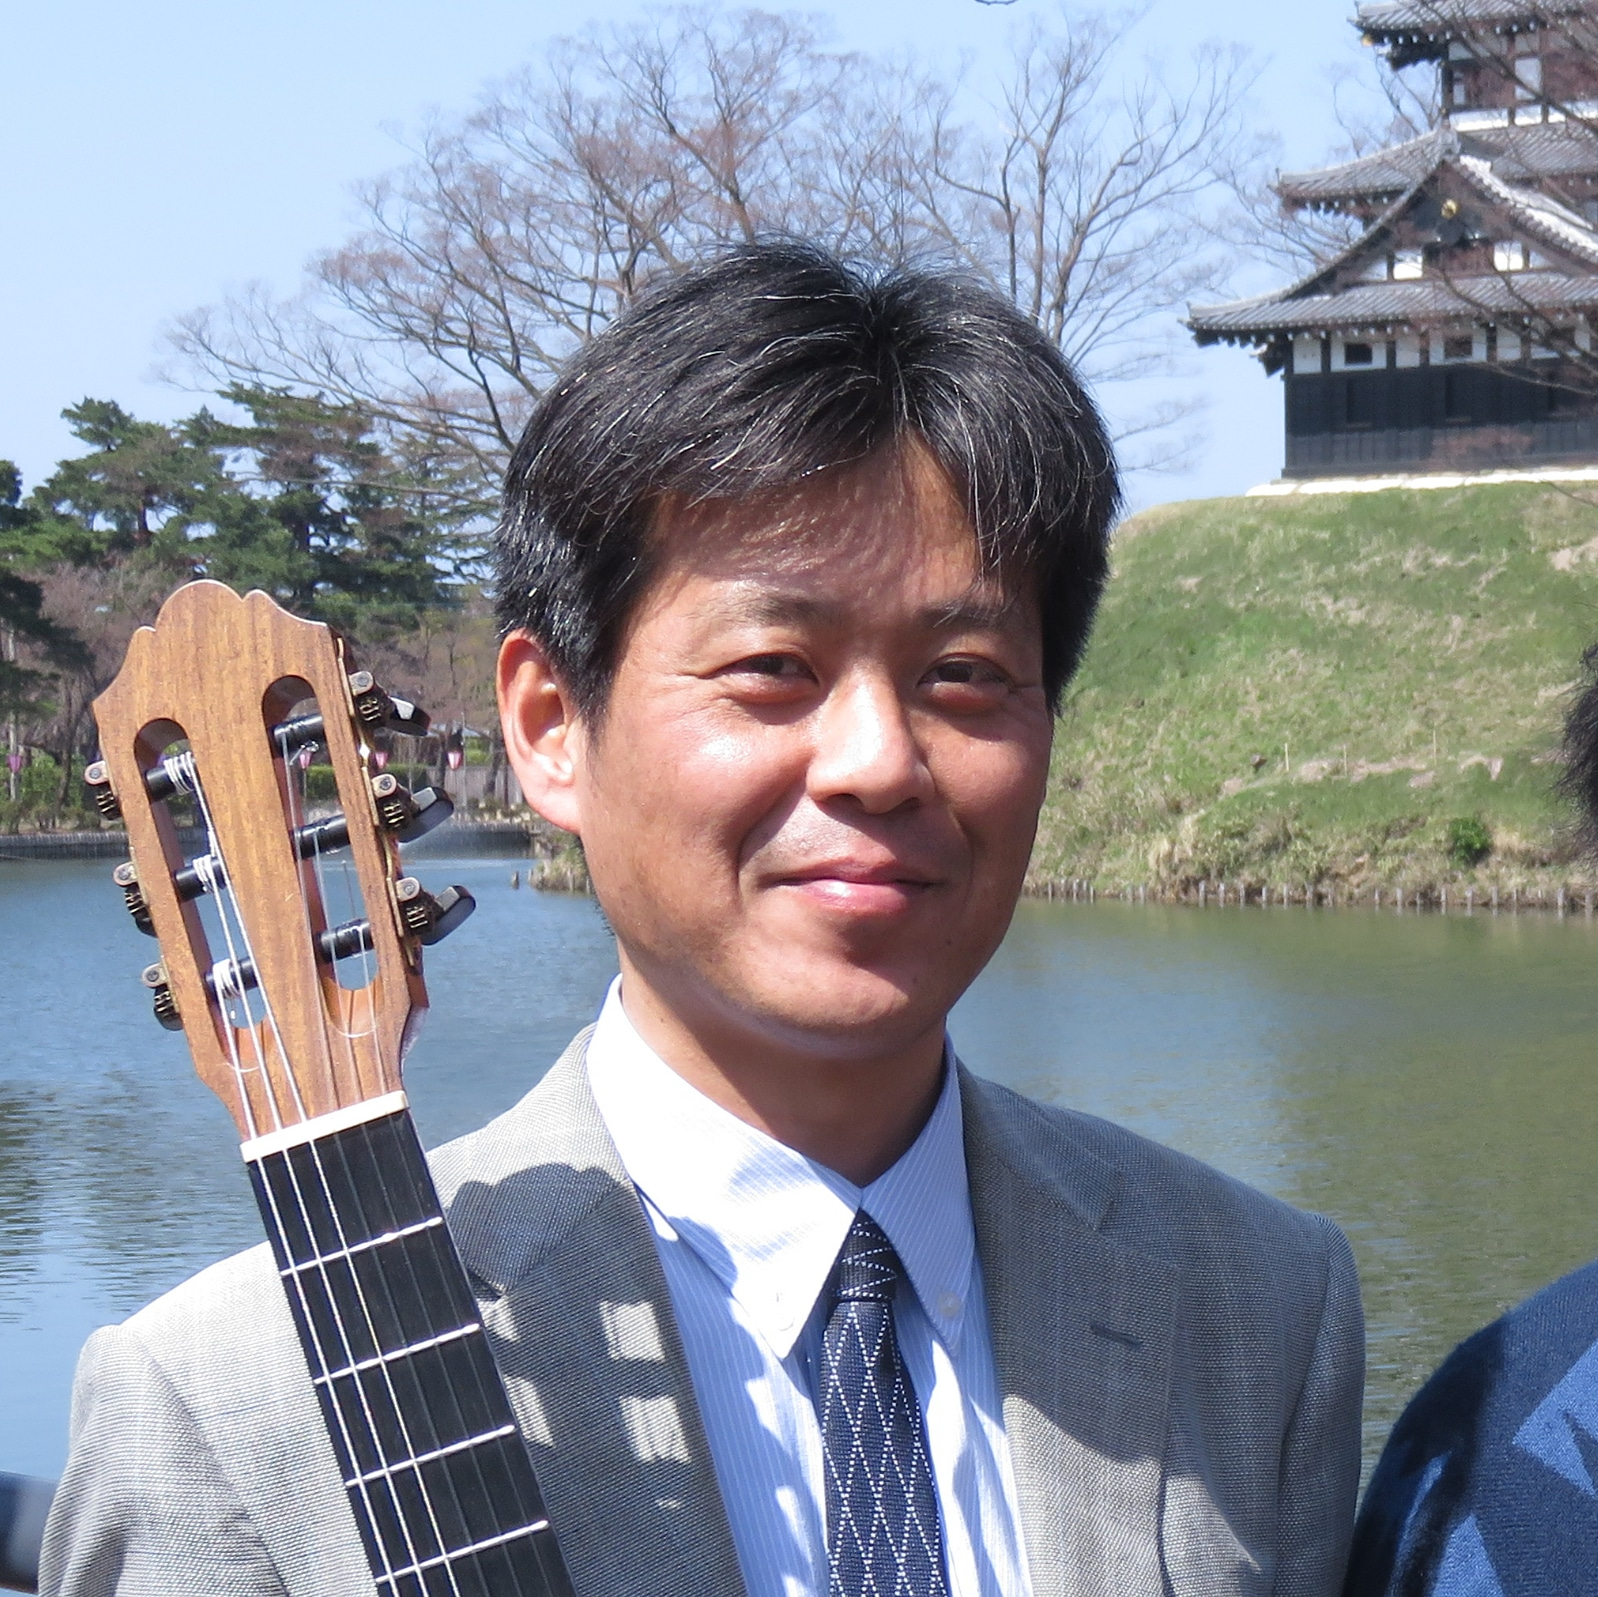 上越新堀ギター音楽院高田教室